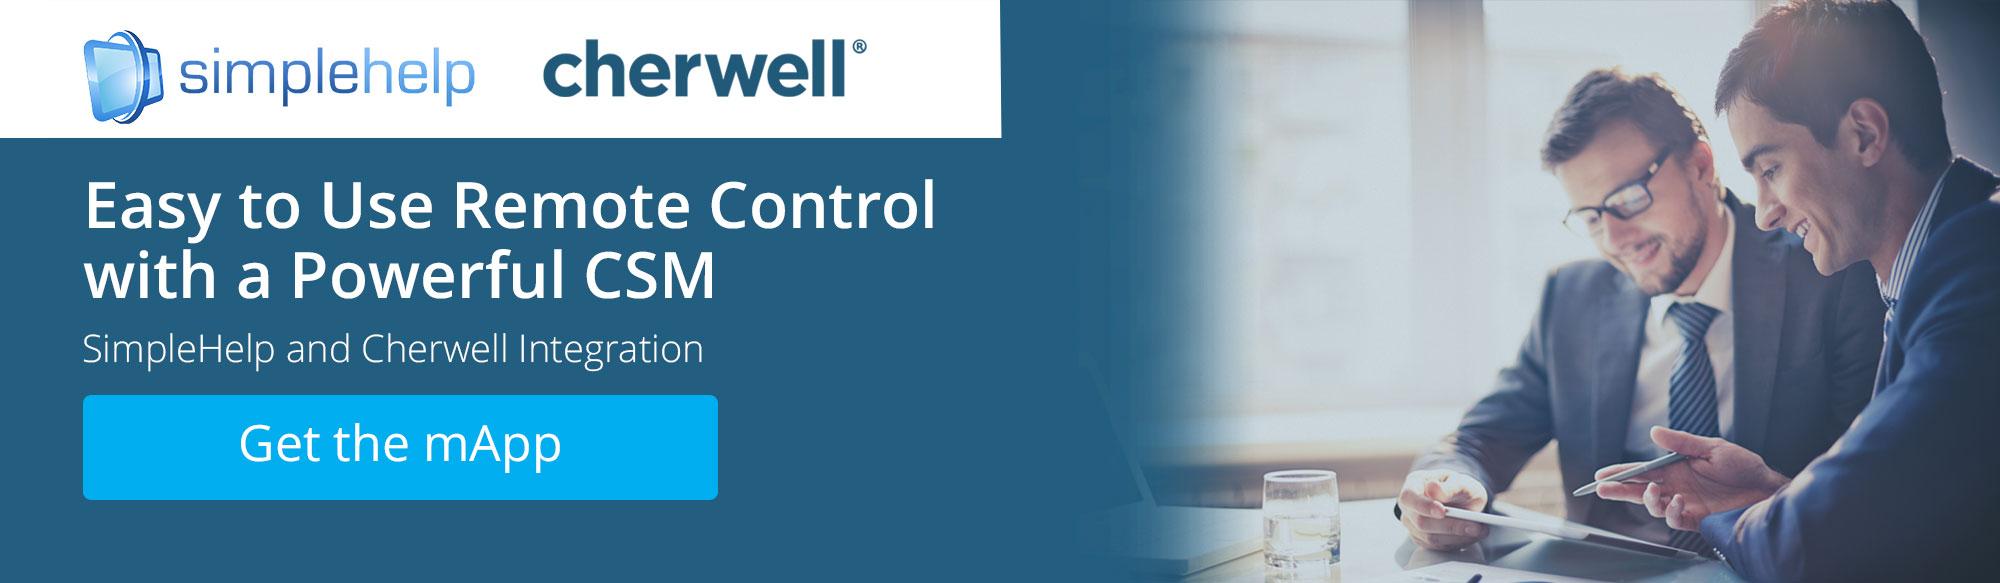 SimlpleHelp and Cherwell Integration, Get the mApp